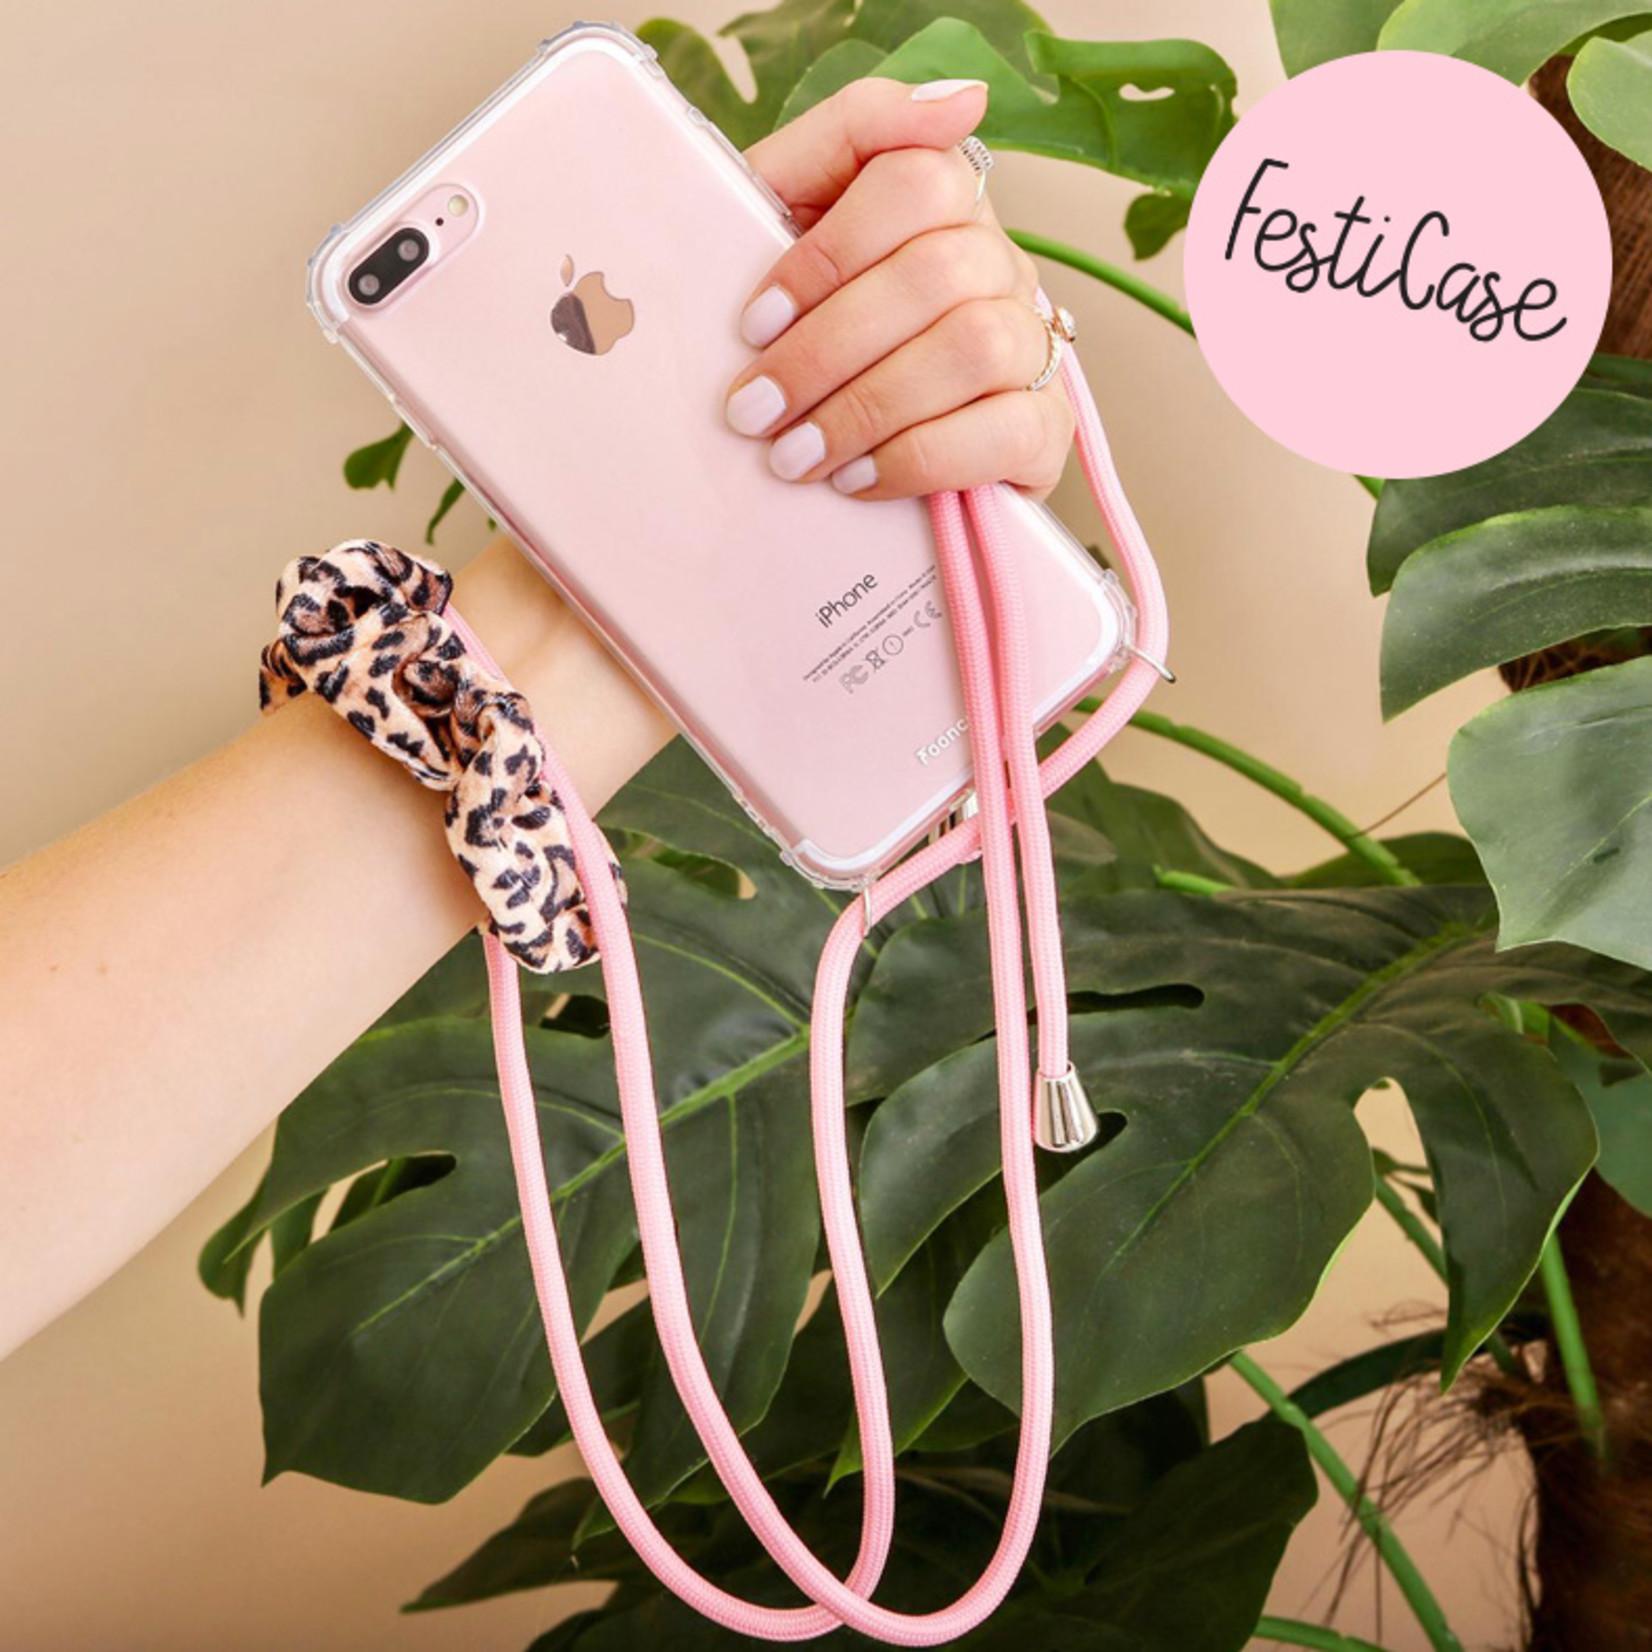 FOONCASE FESTICASE iPhone 6 / 6s Telefoonhoesje met koord (Roze) TPU Soft Case - Transparant